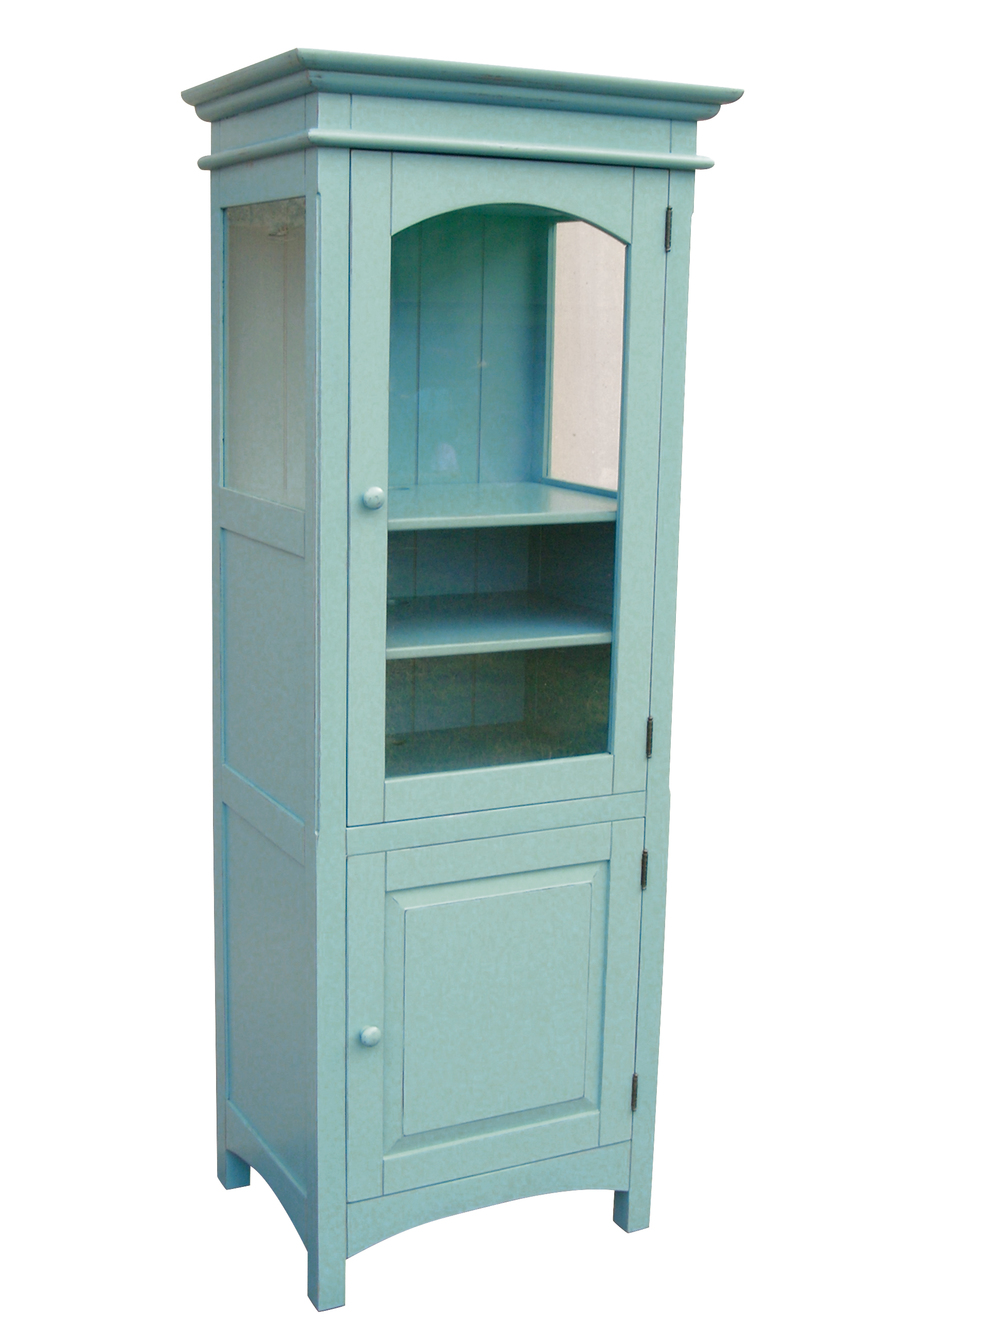 Trade Winds Furniture - Dover Curio Cabinet